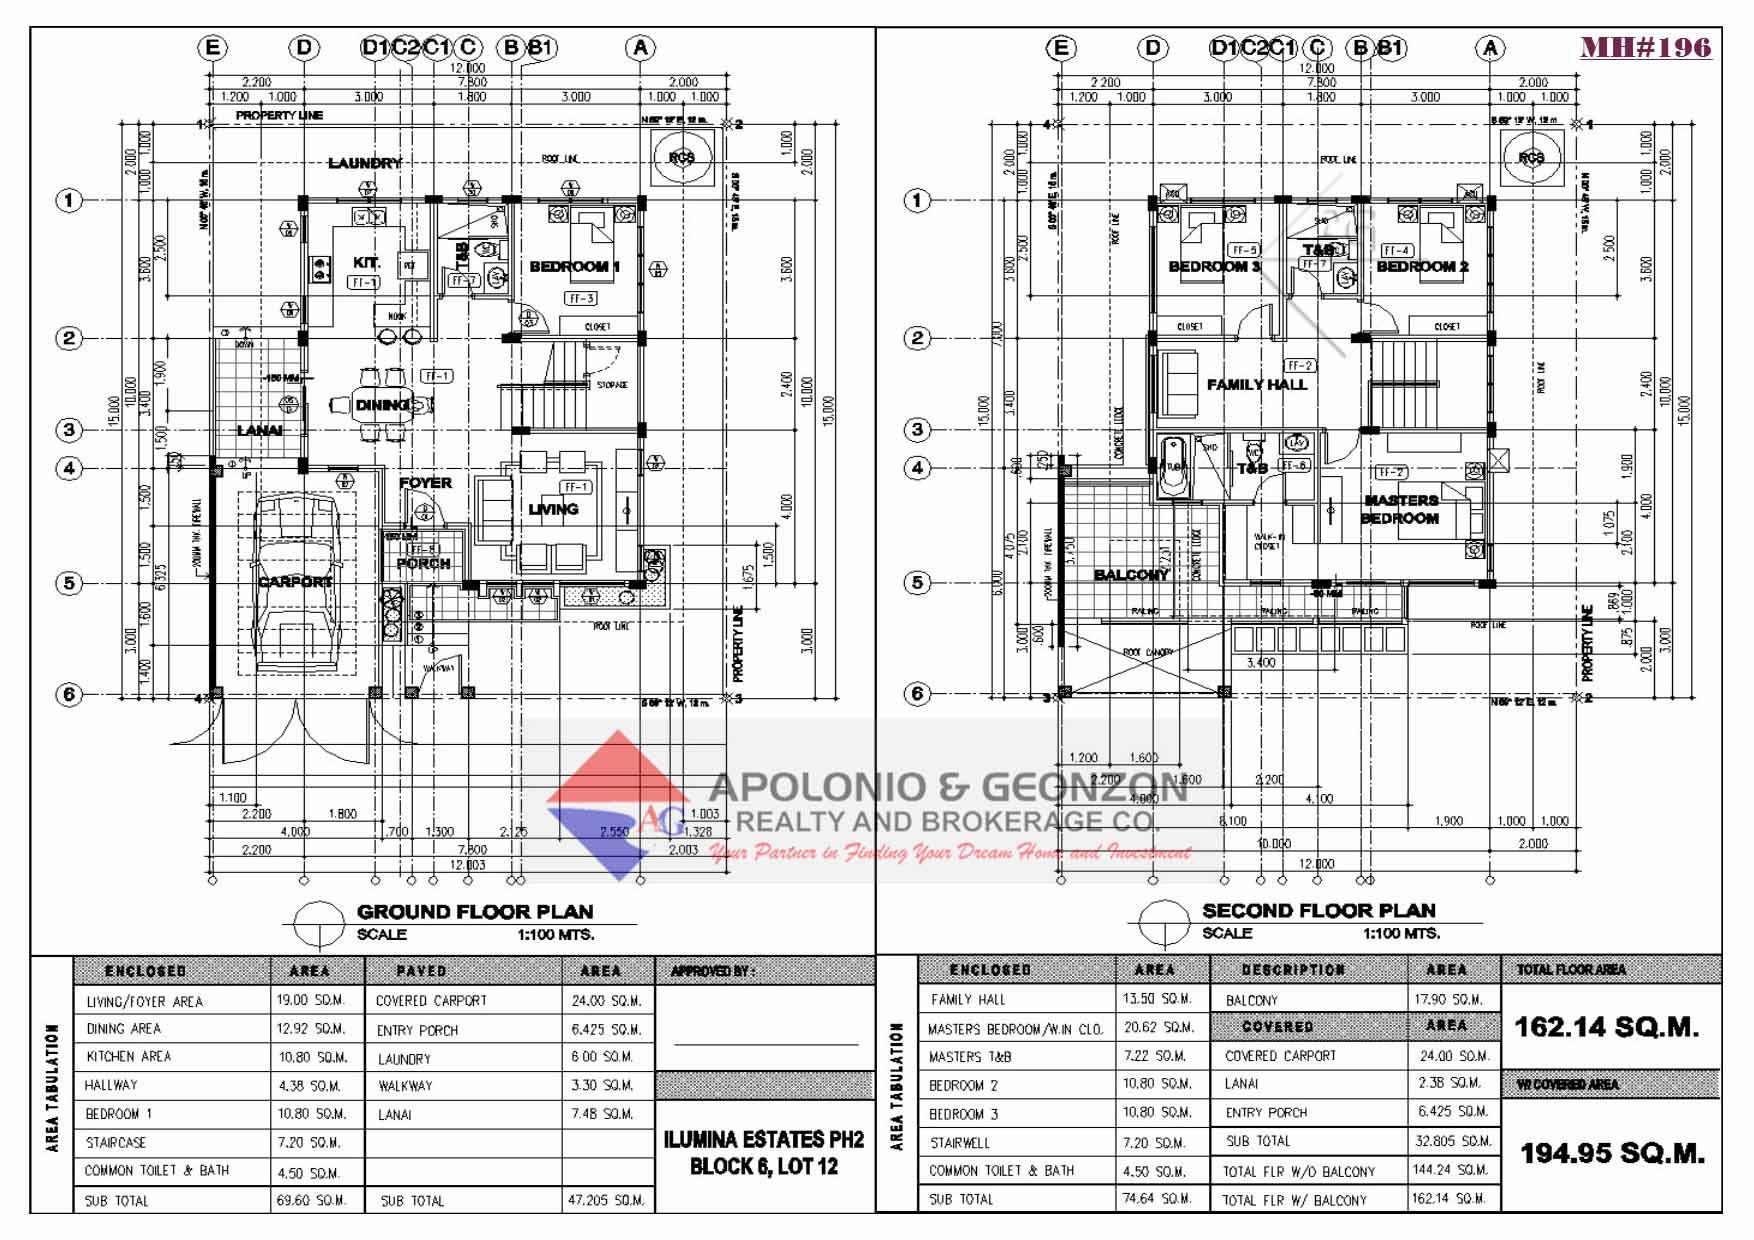 ilumina-estates-2-storey-house-floor-plan-196